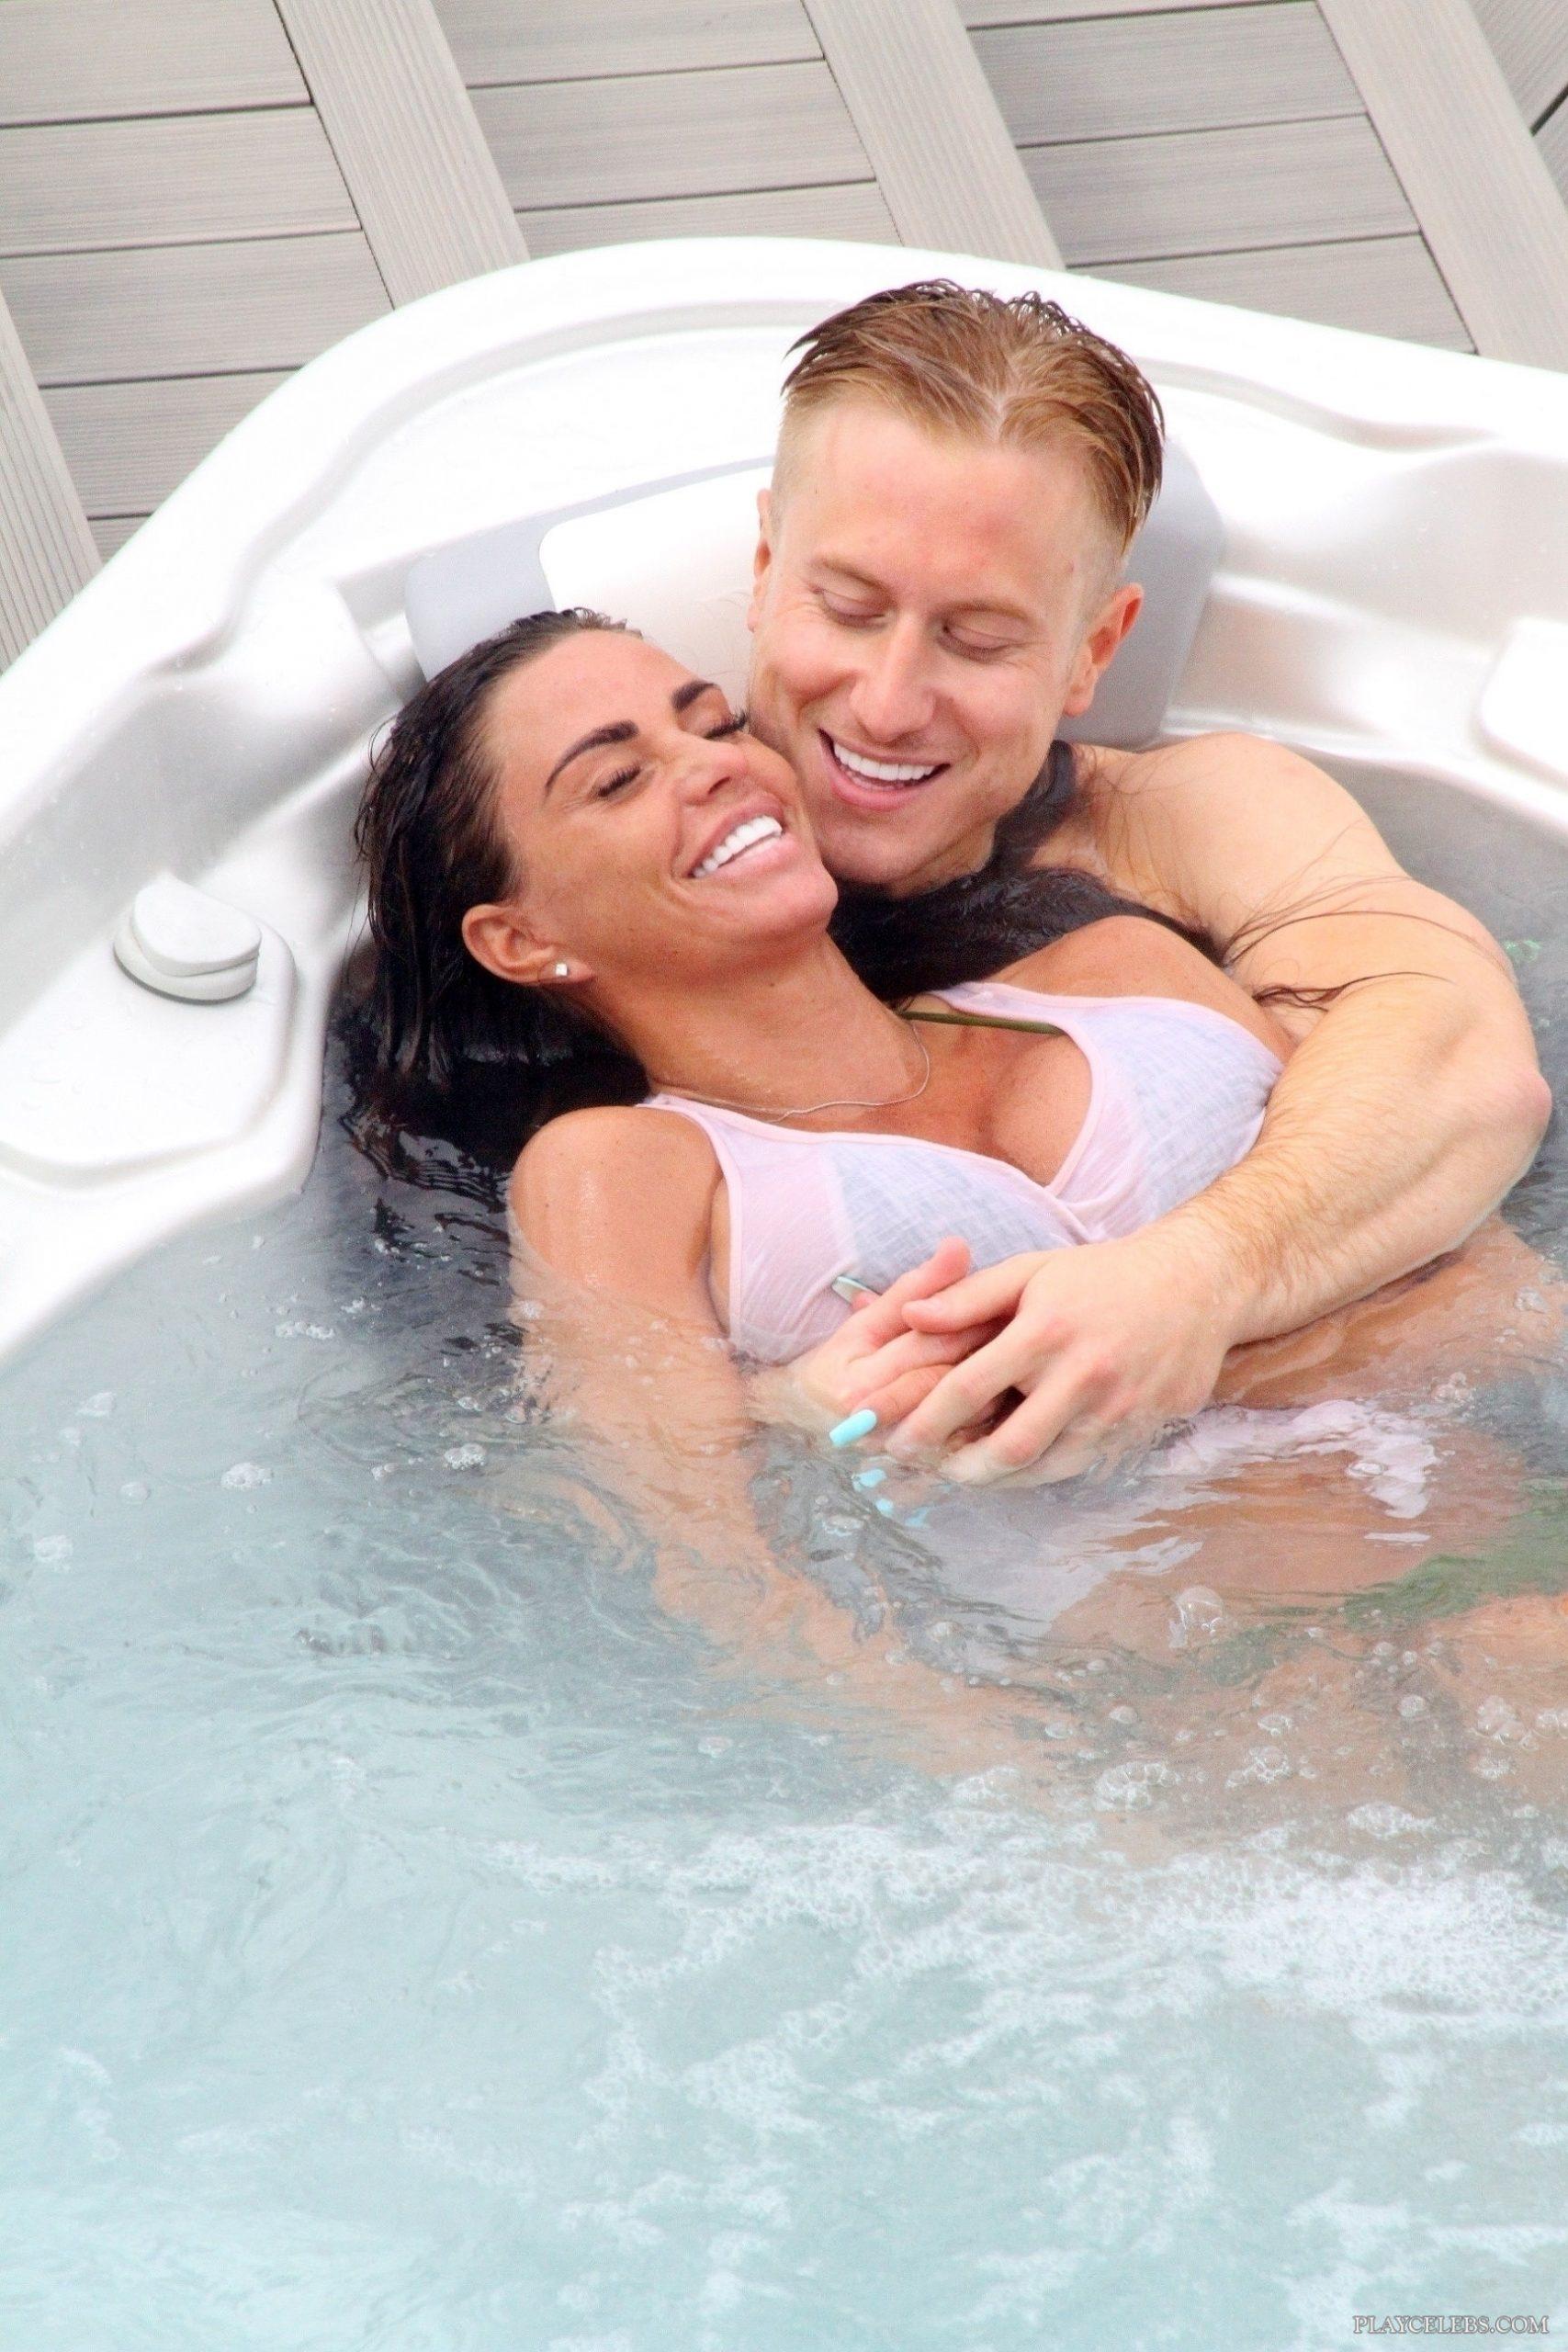 Katie Price Caught In Bikini With New Boyfriend In A Jacuzzi